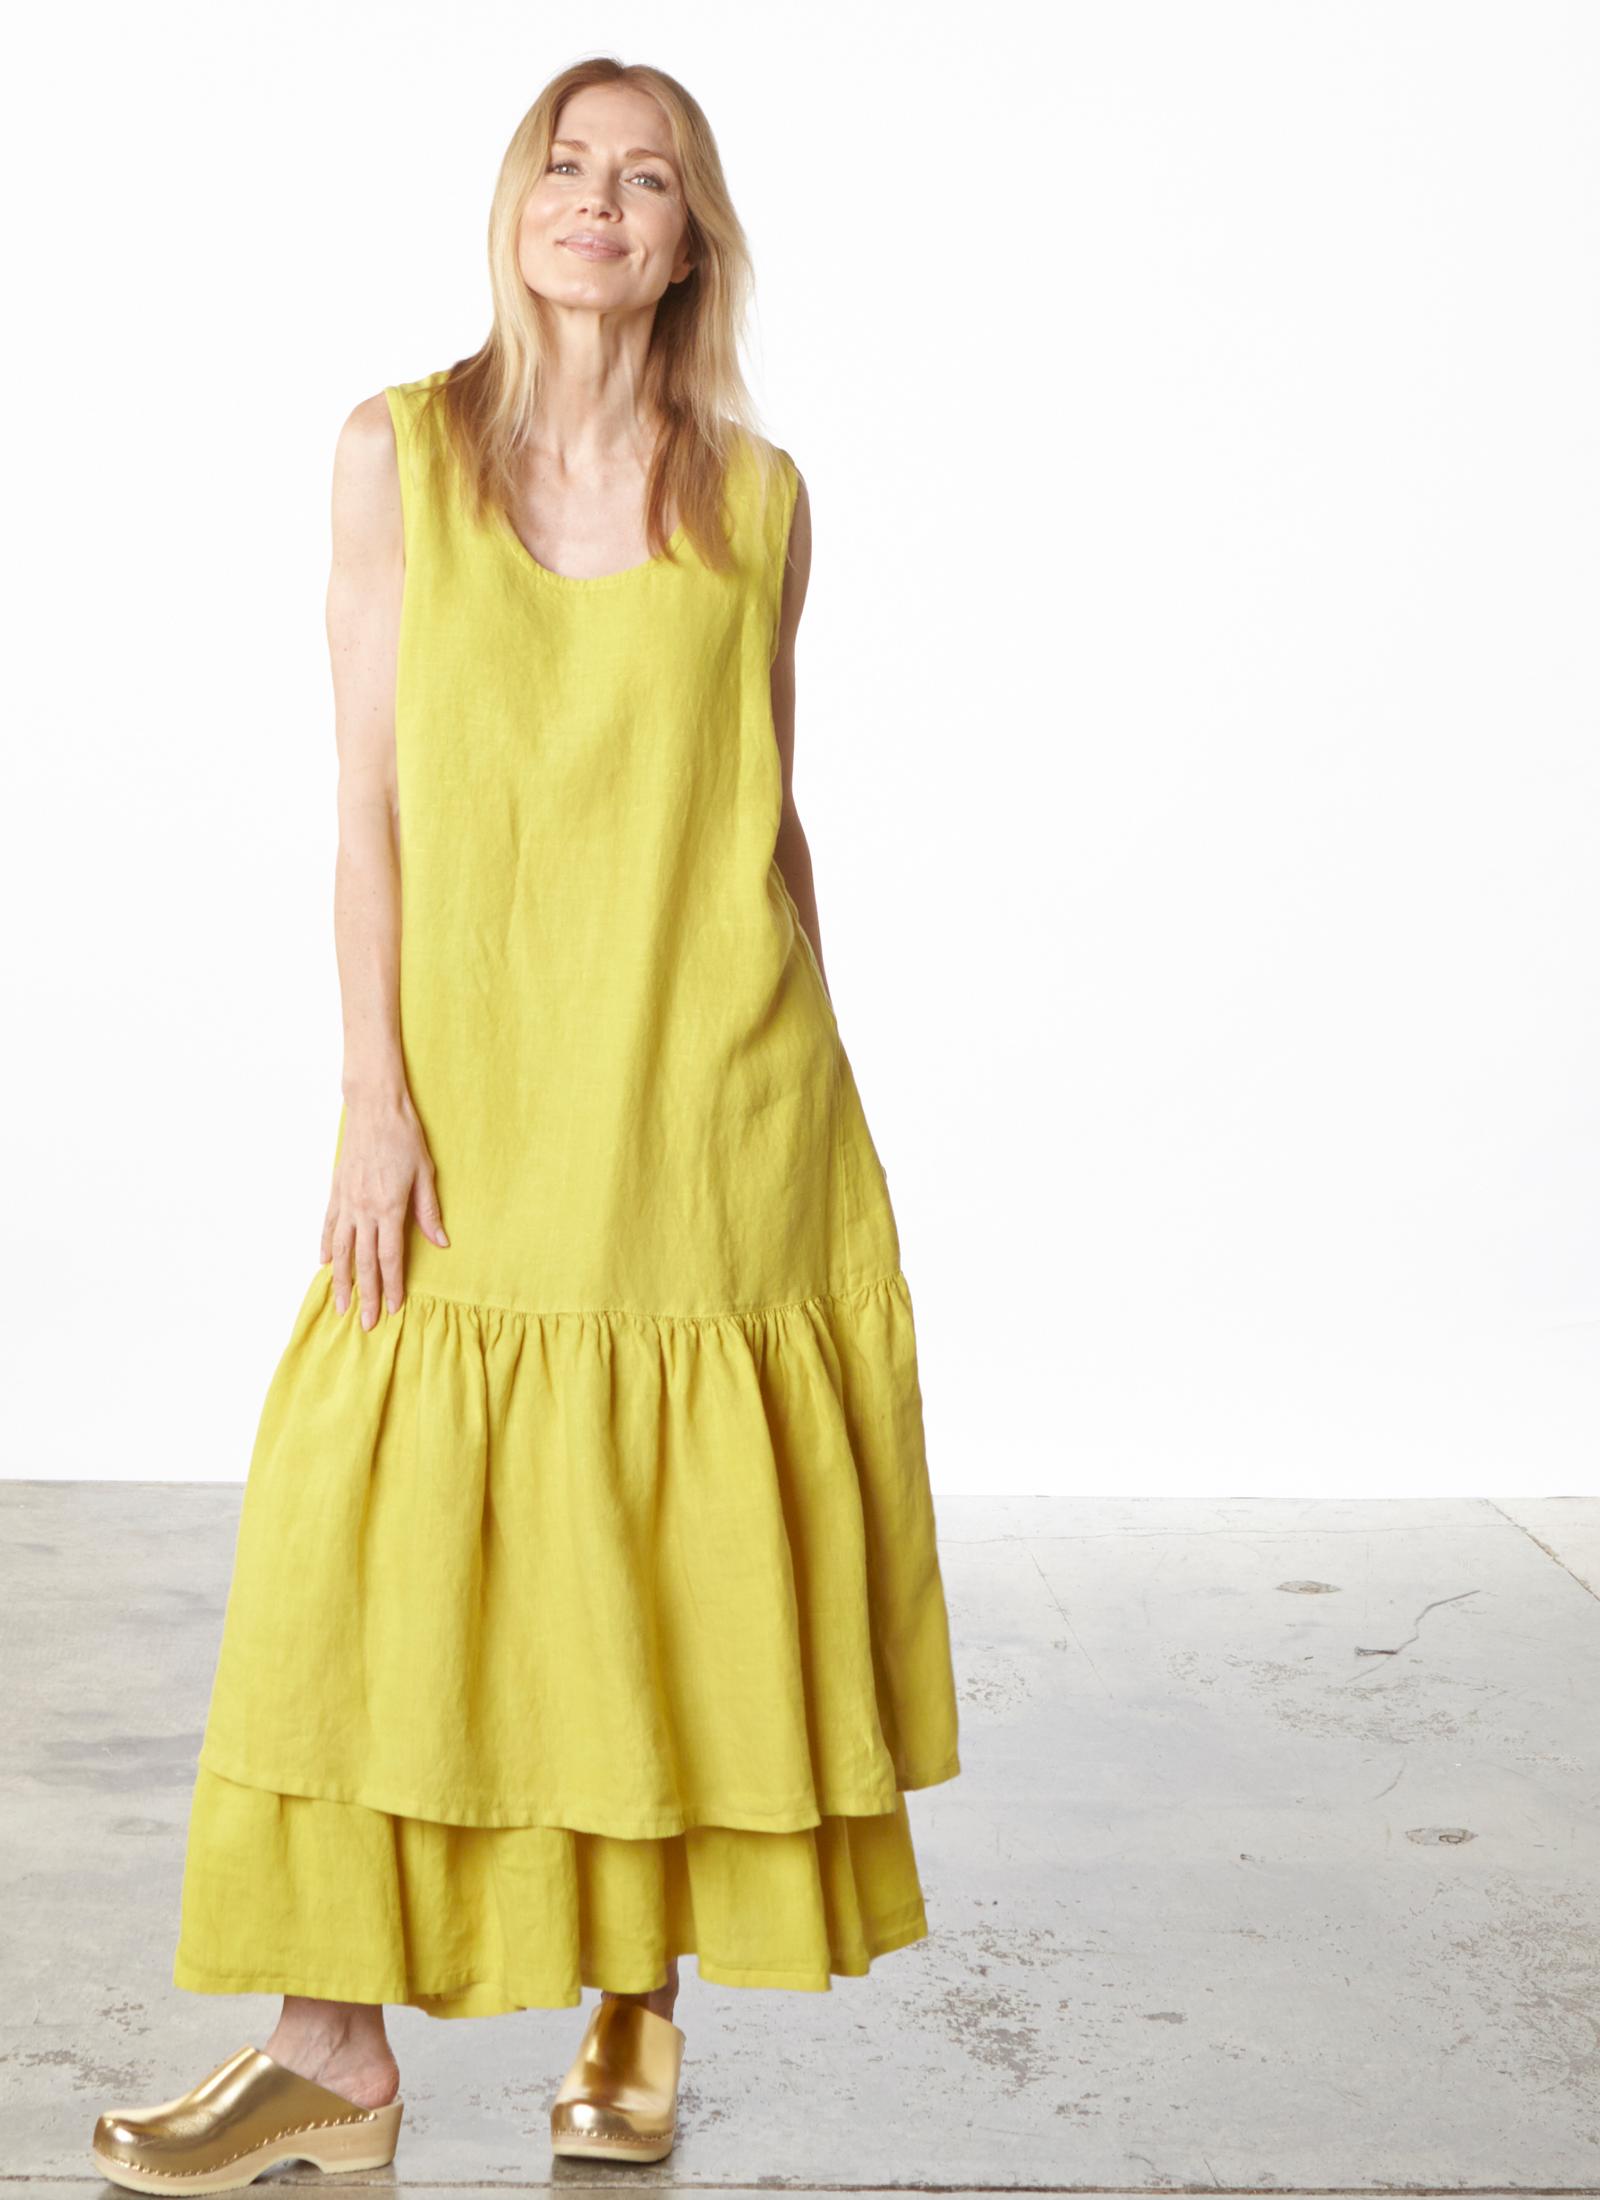 Salome Dress, Ruffle Skirt in Oriole Light Linen